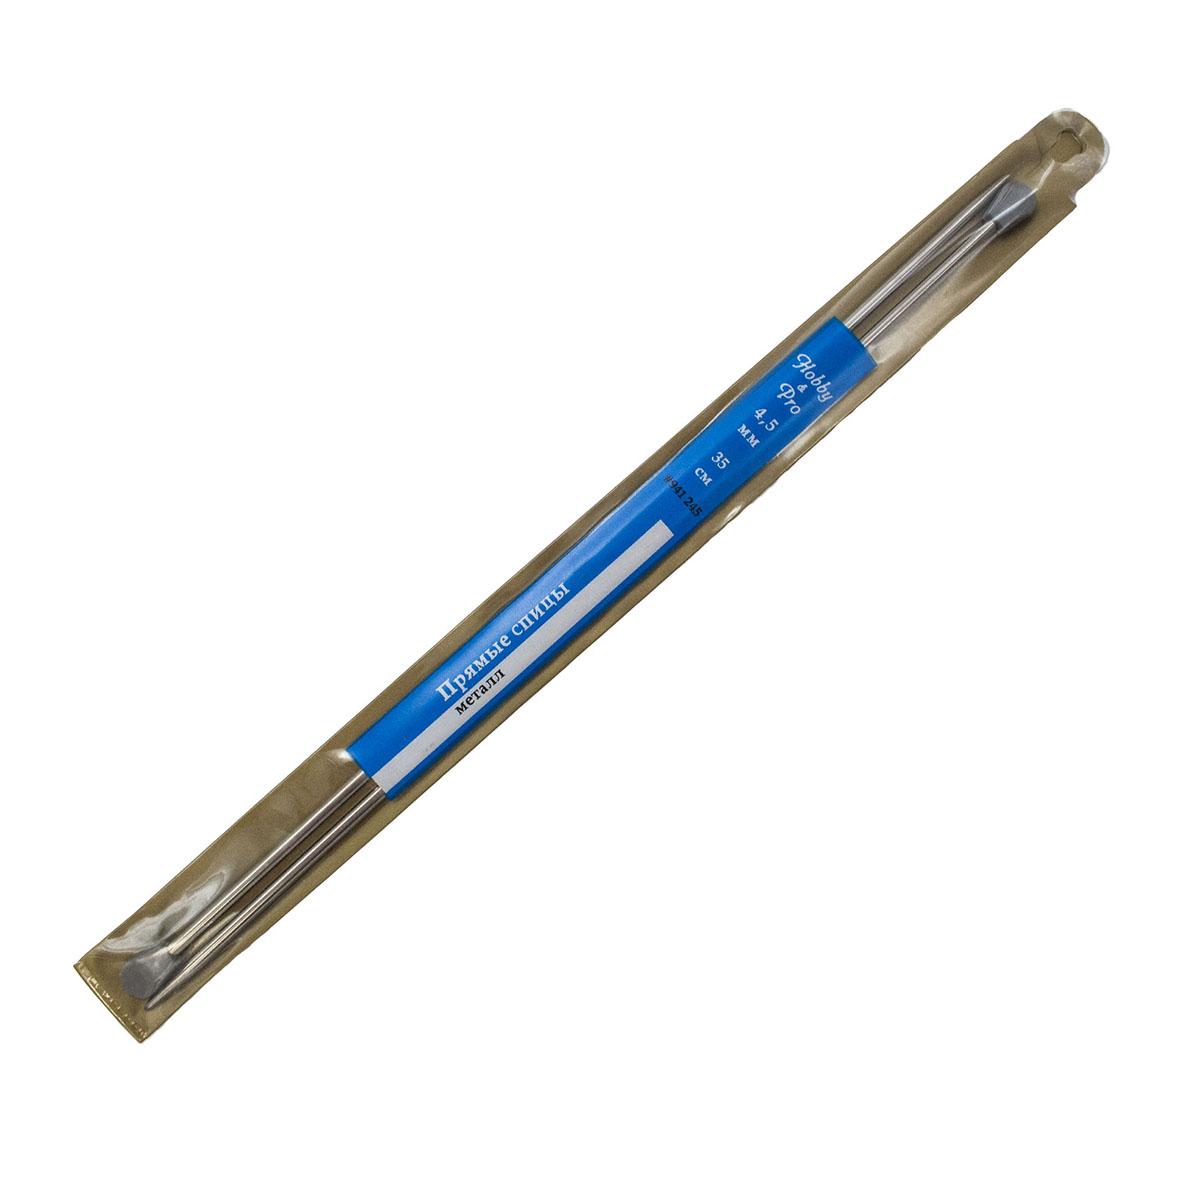 941245 Спицы прямые металл 35см, 4,5мм Hobby&Pro